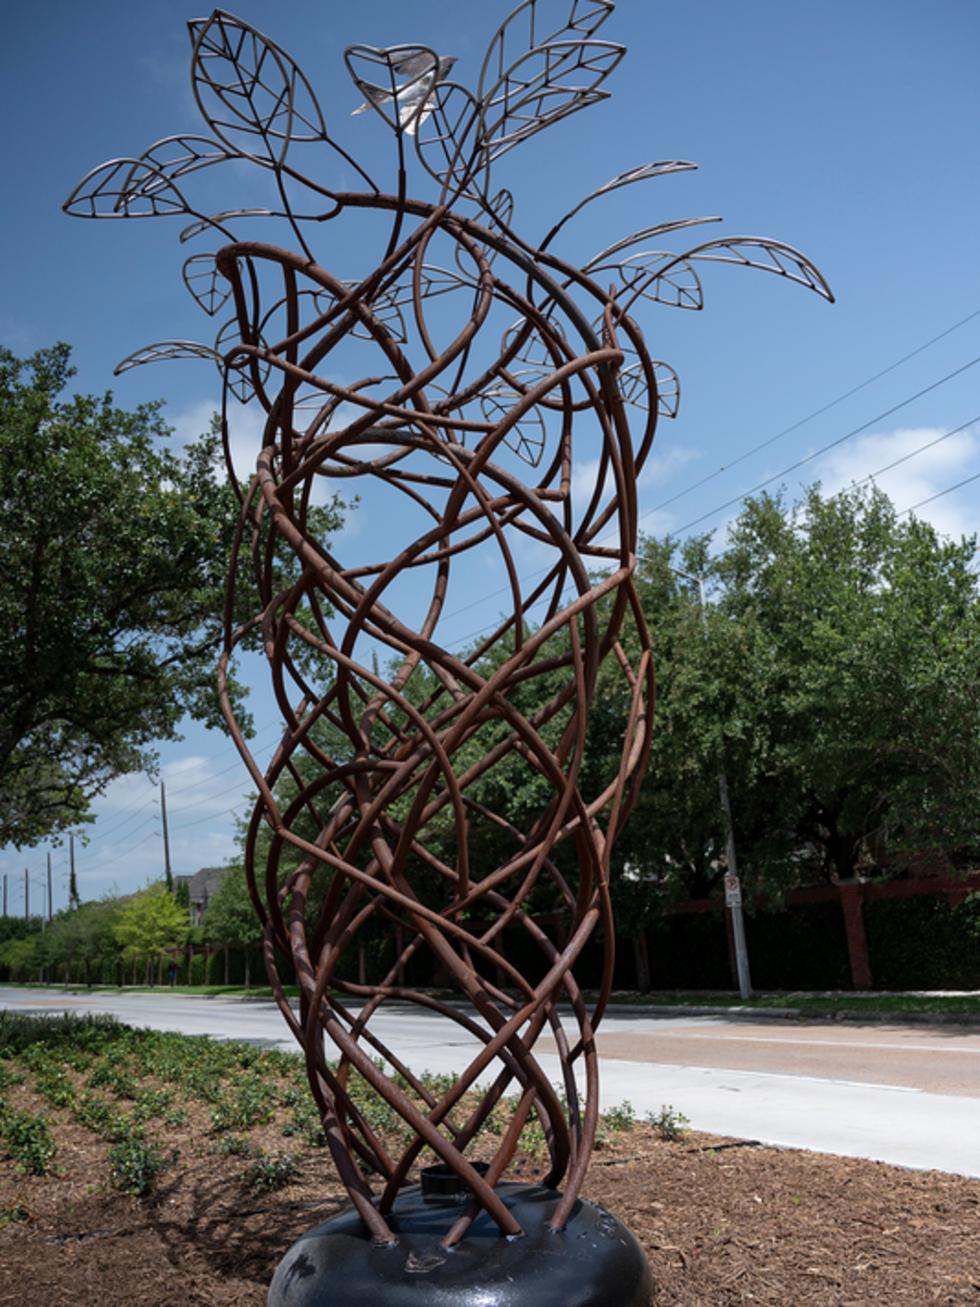 Galleria sculpture Whirlwind